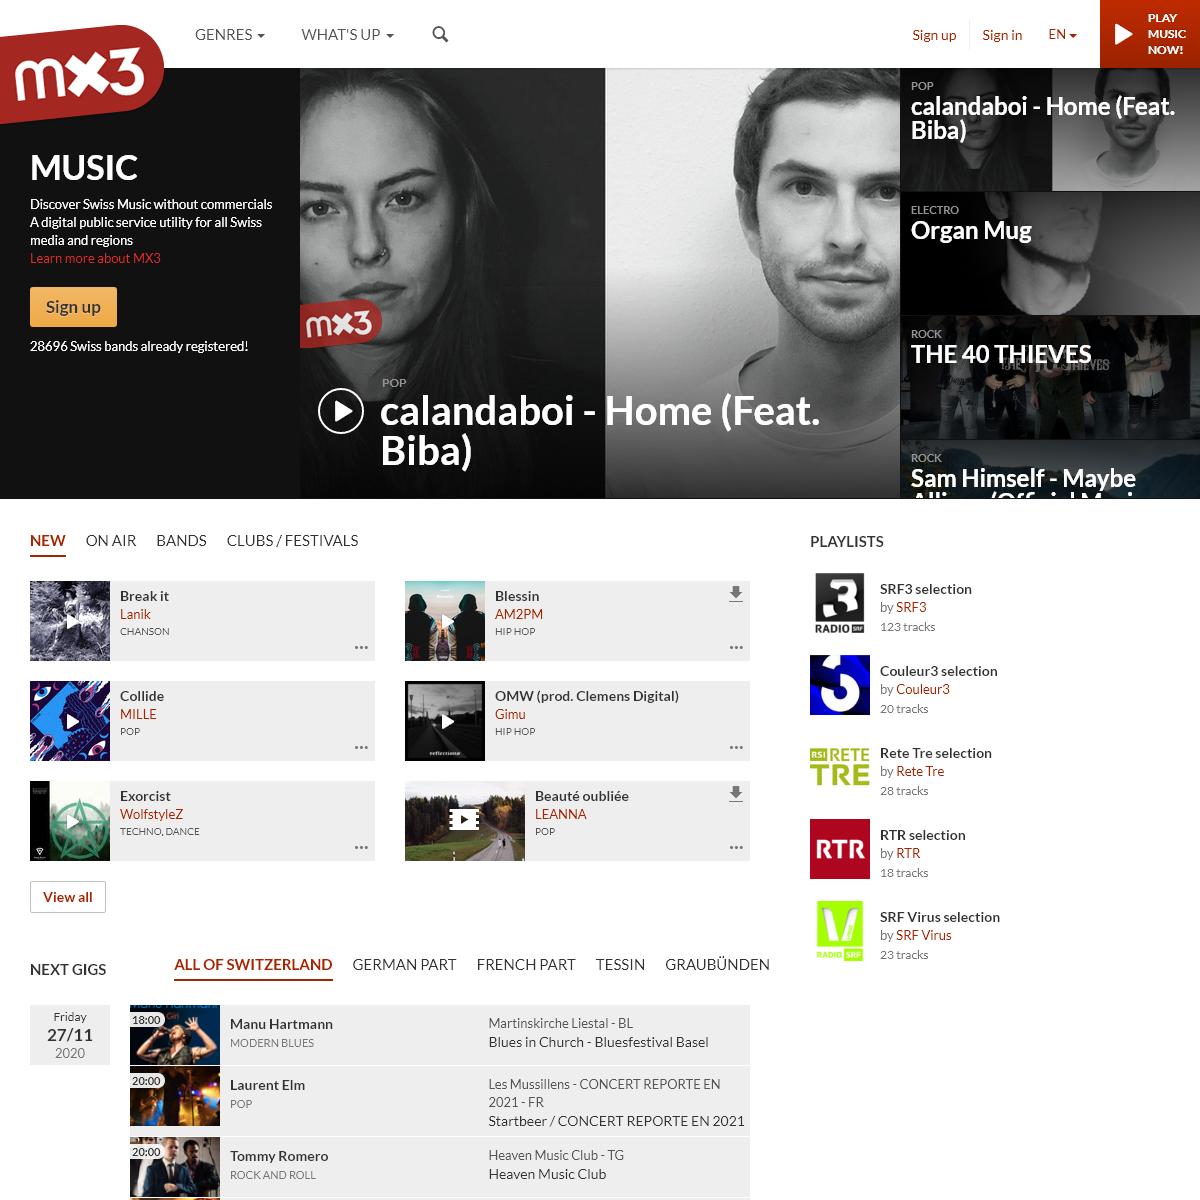 The Swiss Music Portal - Mx3.ch